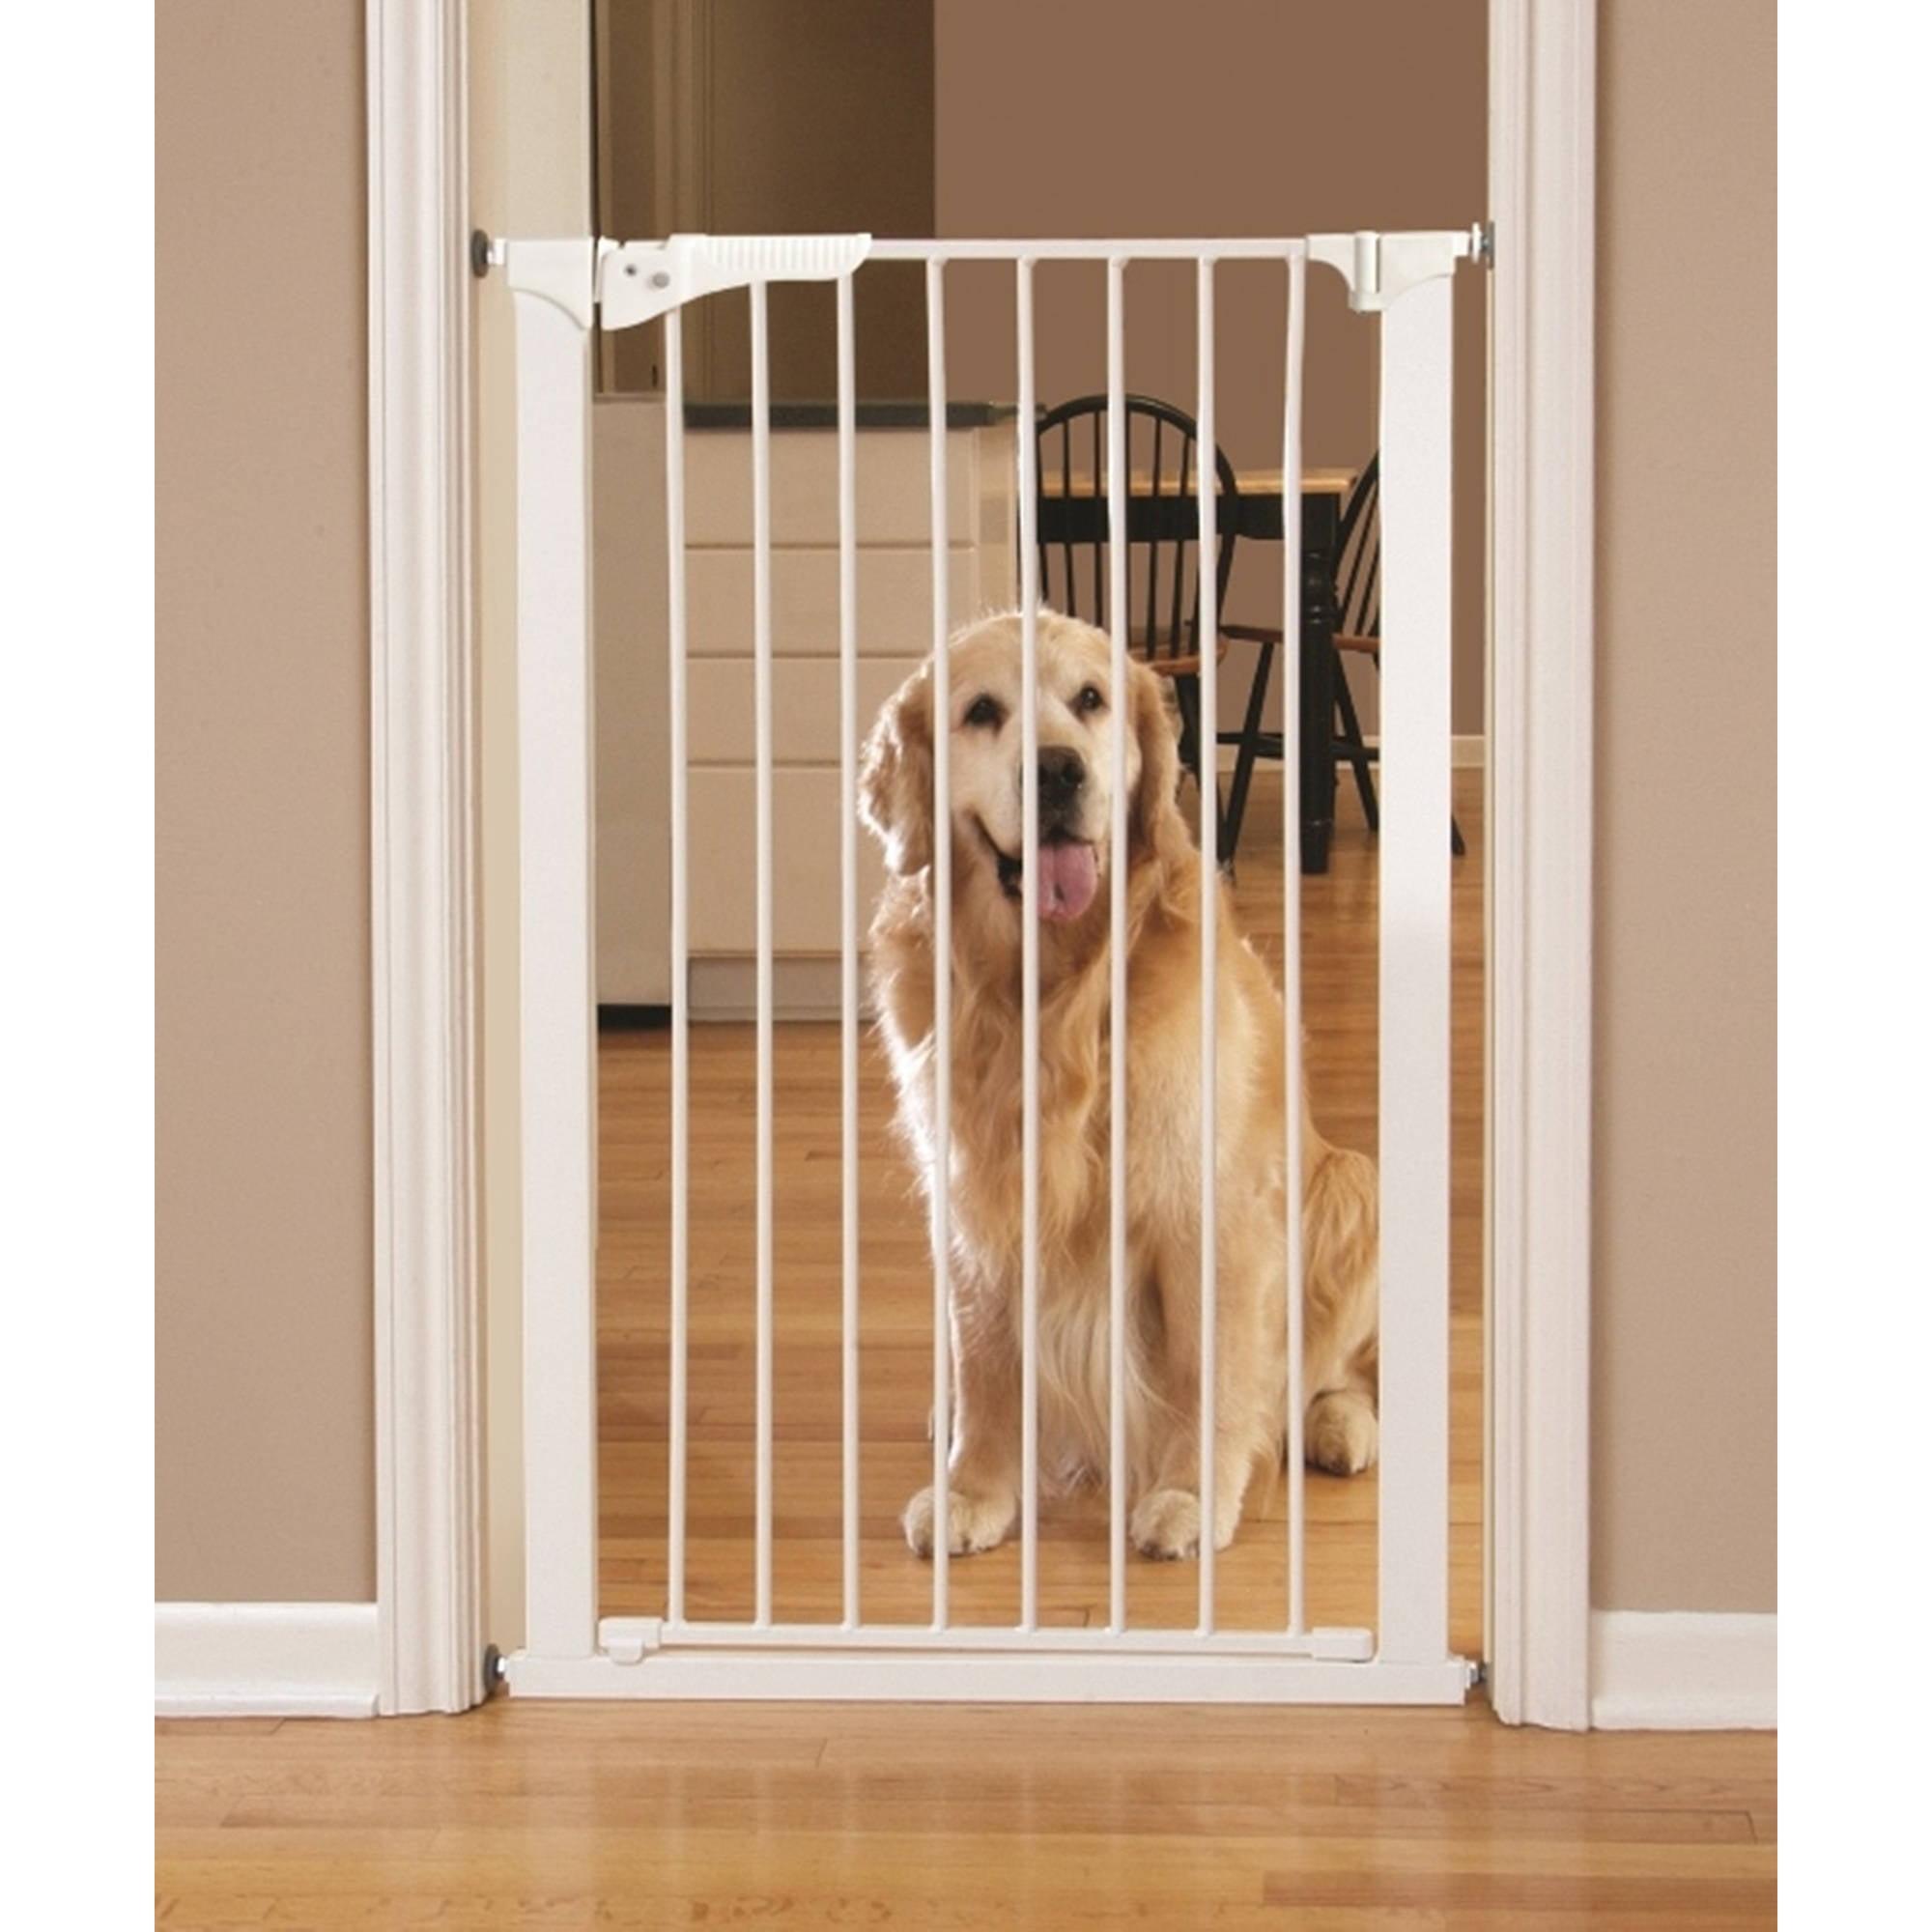 Command Pet Tall Pressure Gate   Walmart.com